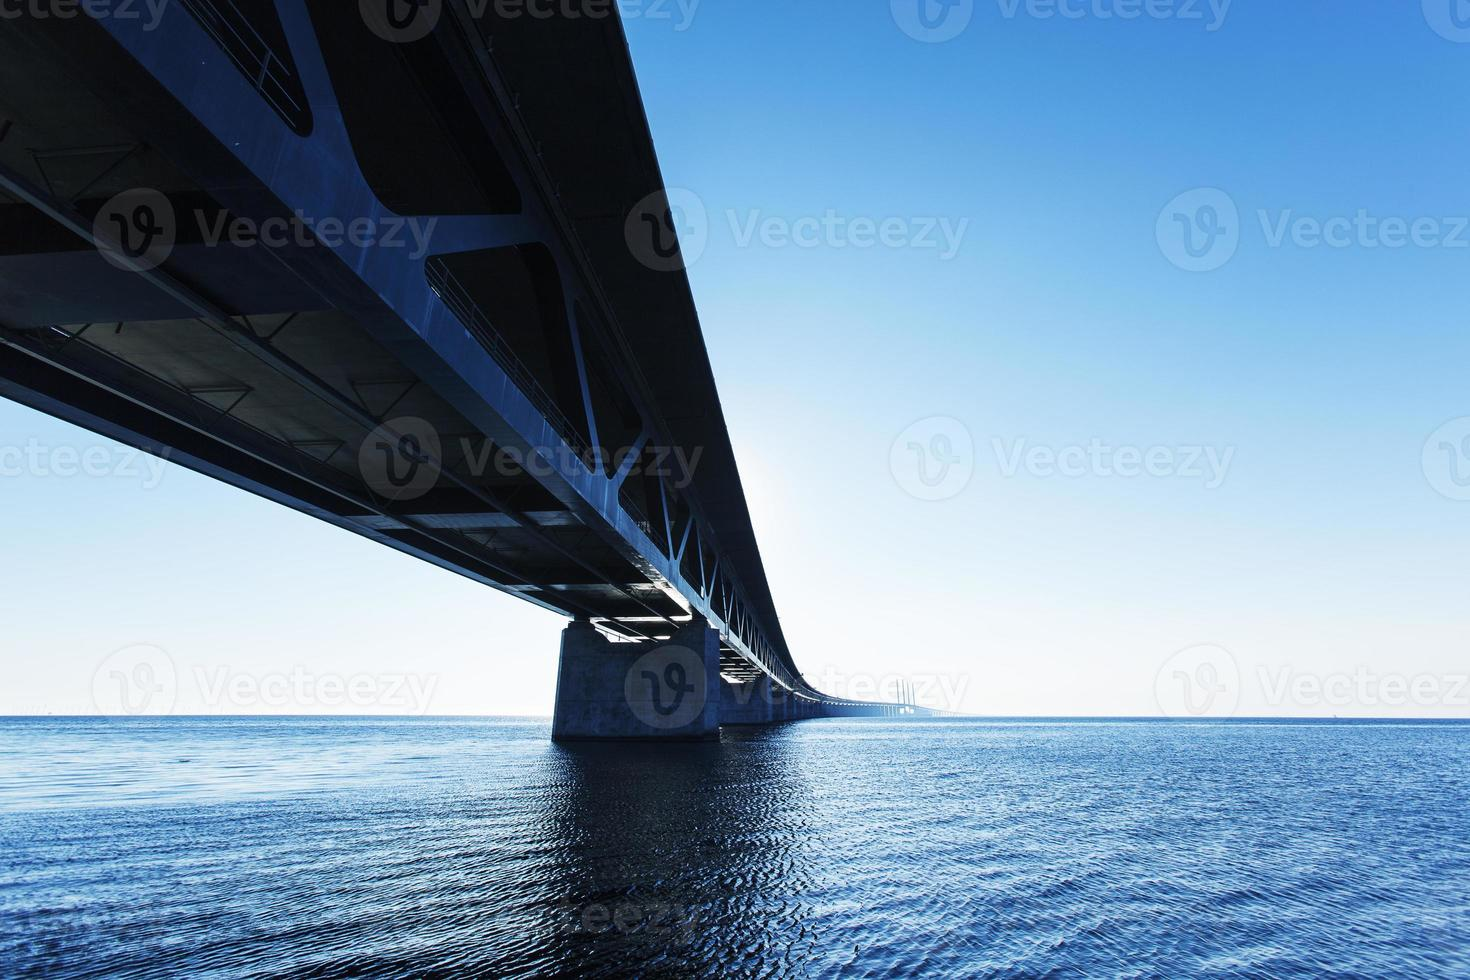 Öresundsbron, Öresundsbron, Bro på havet, foto